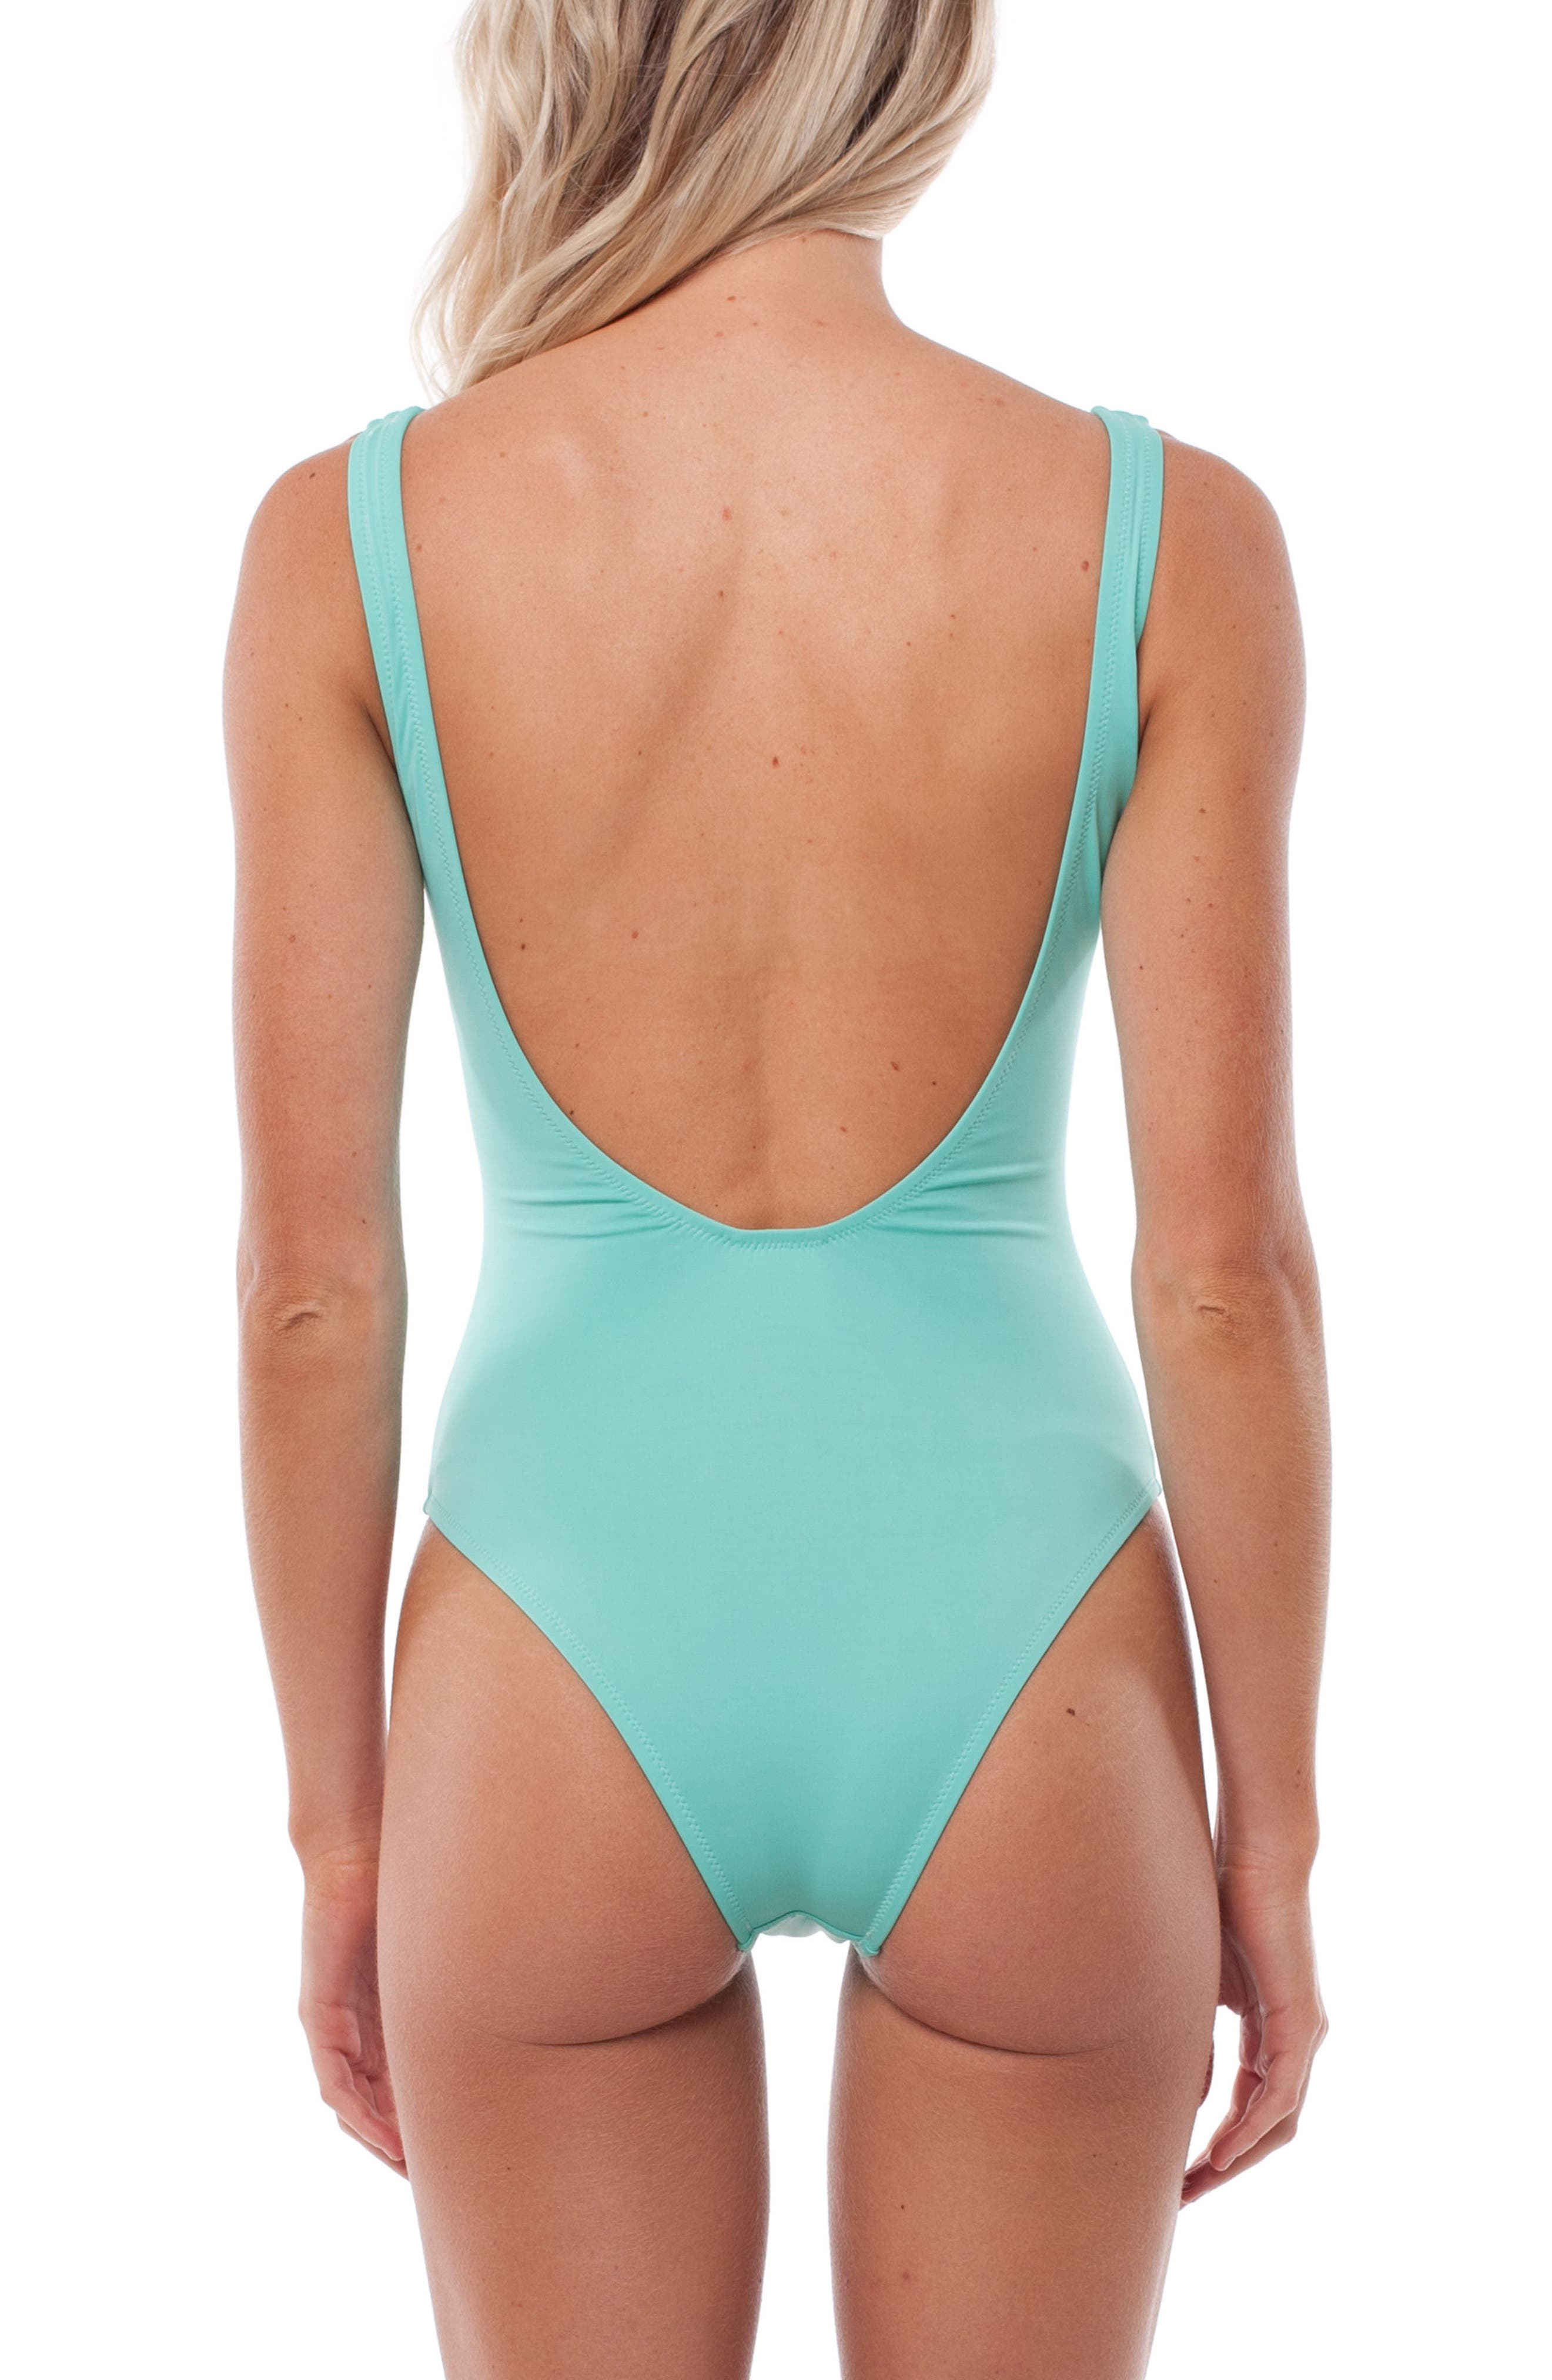 Gidget One-Piece Swimsuit,                             Alternate thumbnail 2, color,                             Aruba